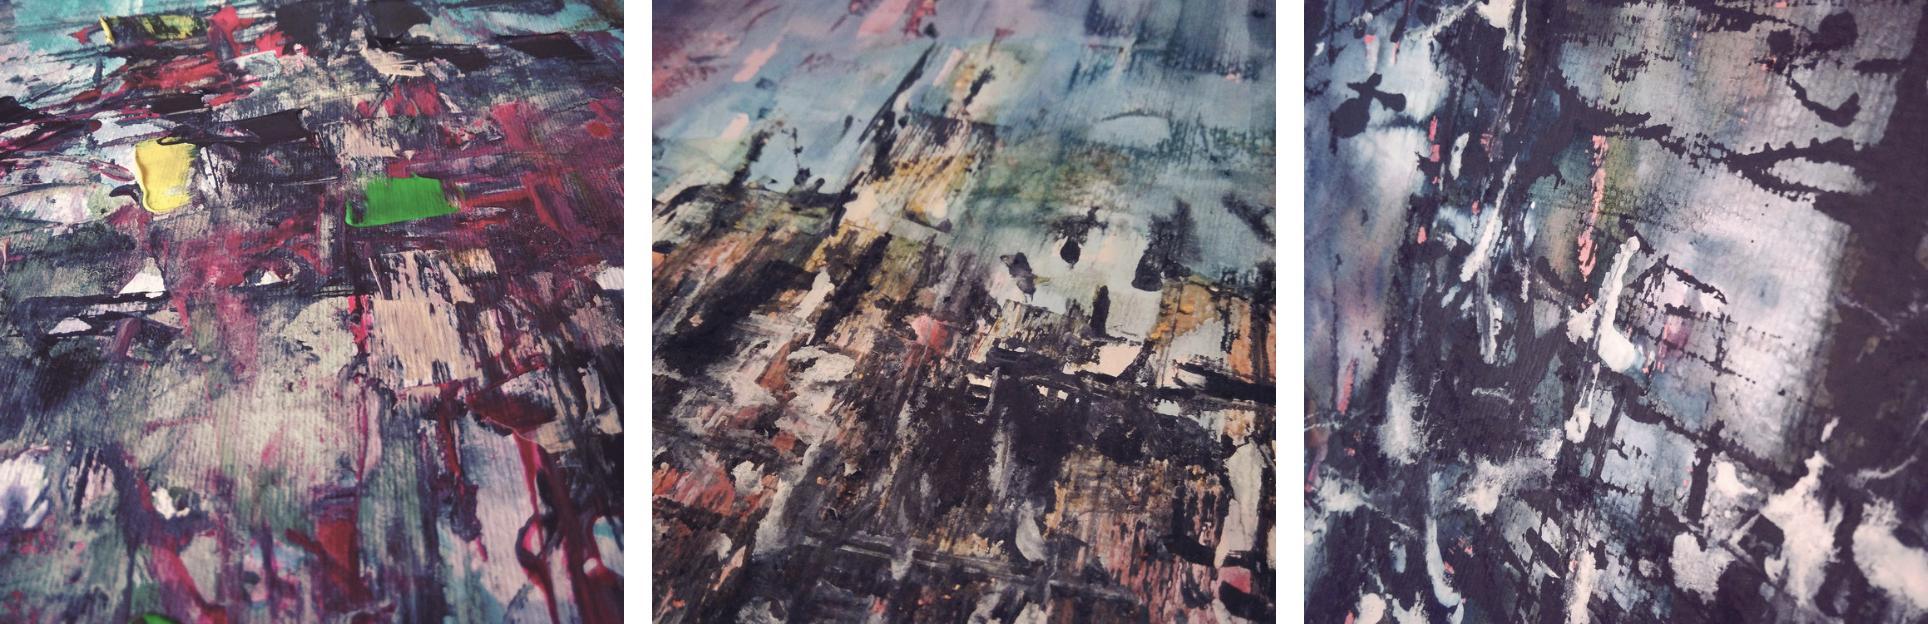 bonjourmolotov Andre Gigante Painting 04.png